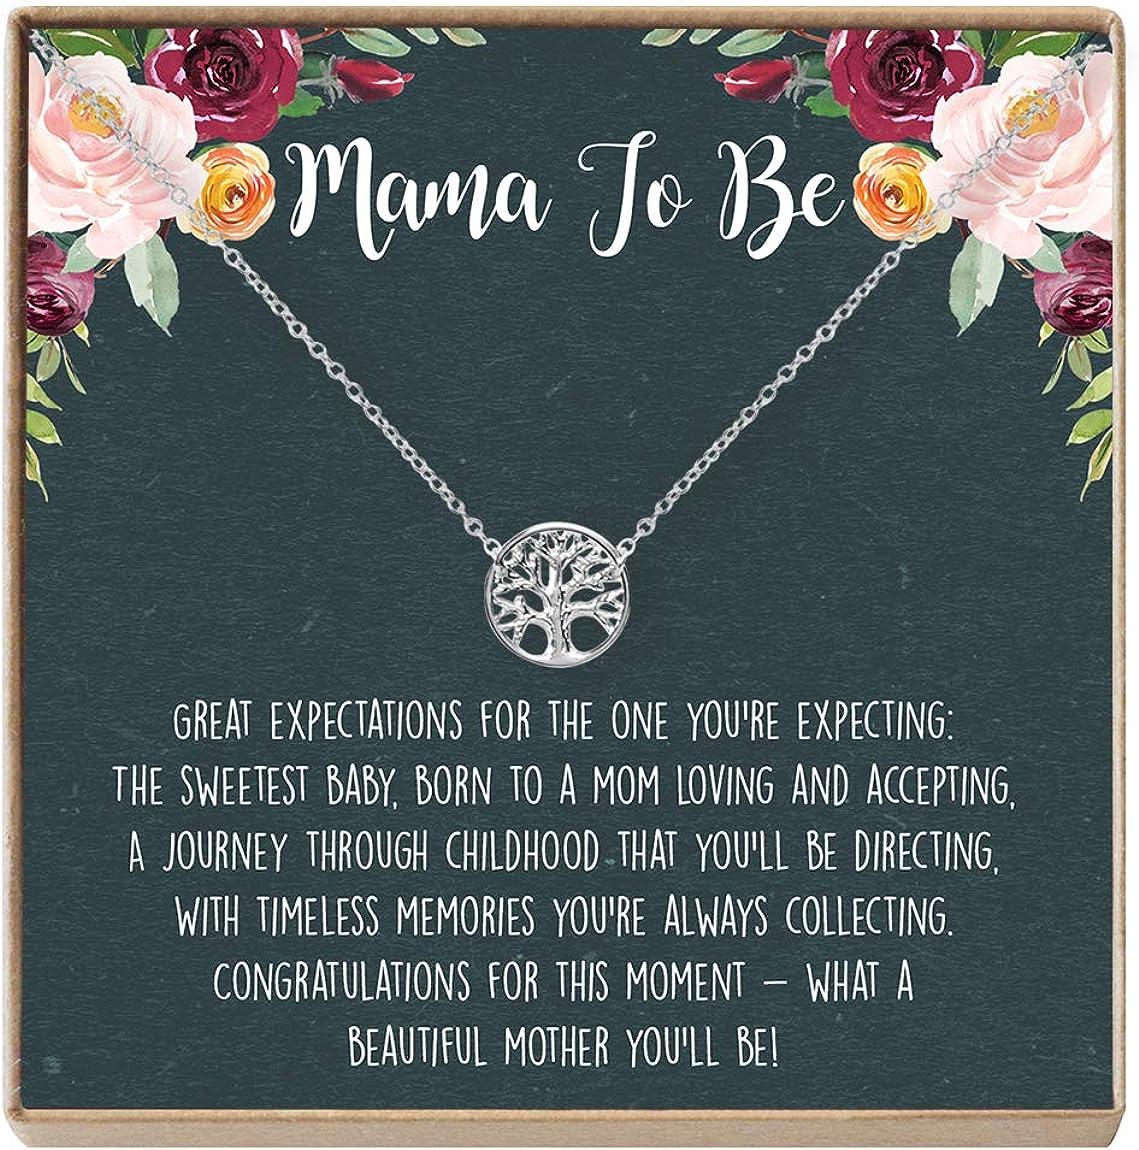 Pregnancy Necklace - Presents Gift Ideas Heartfelt 未使用 出群 Jewe Card